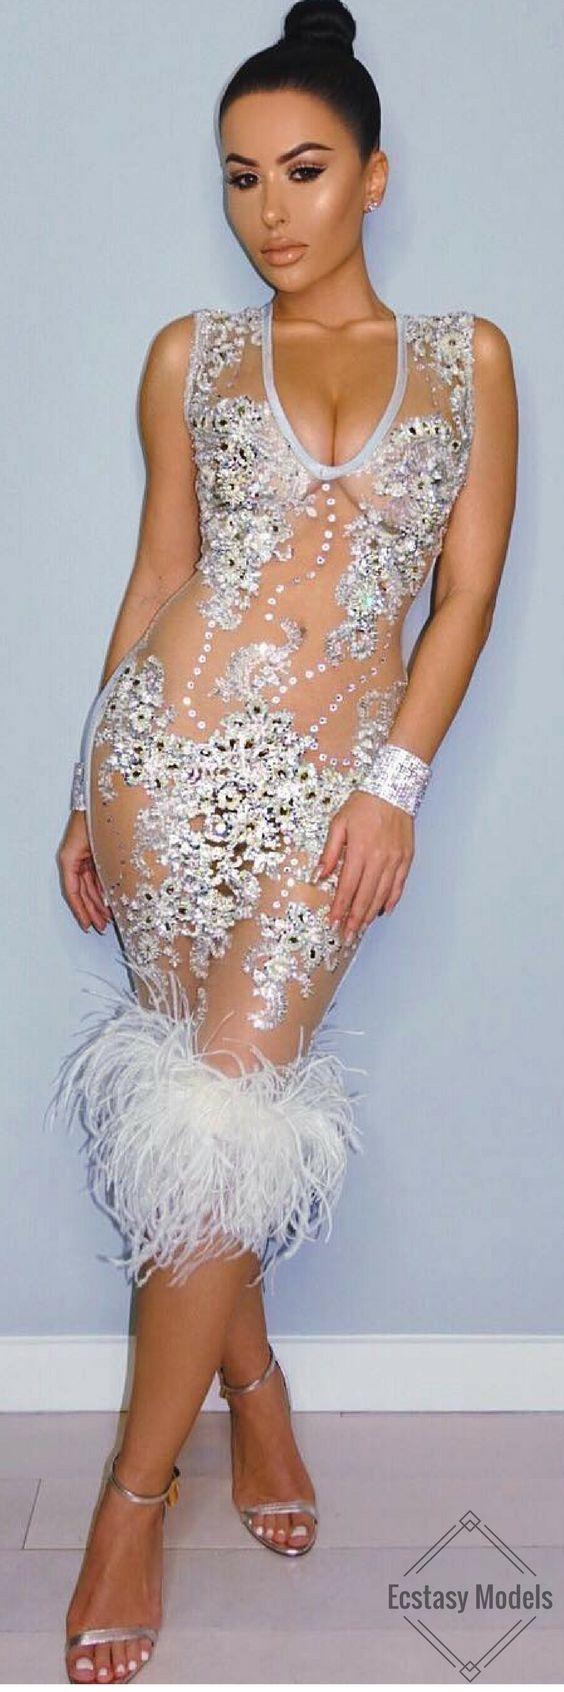 Sparkle // Dress by @daretobevintage // Fashion look by Amra Olević